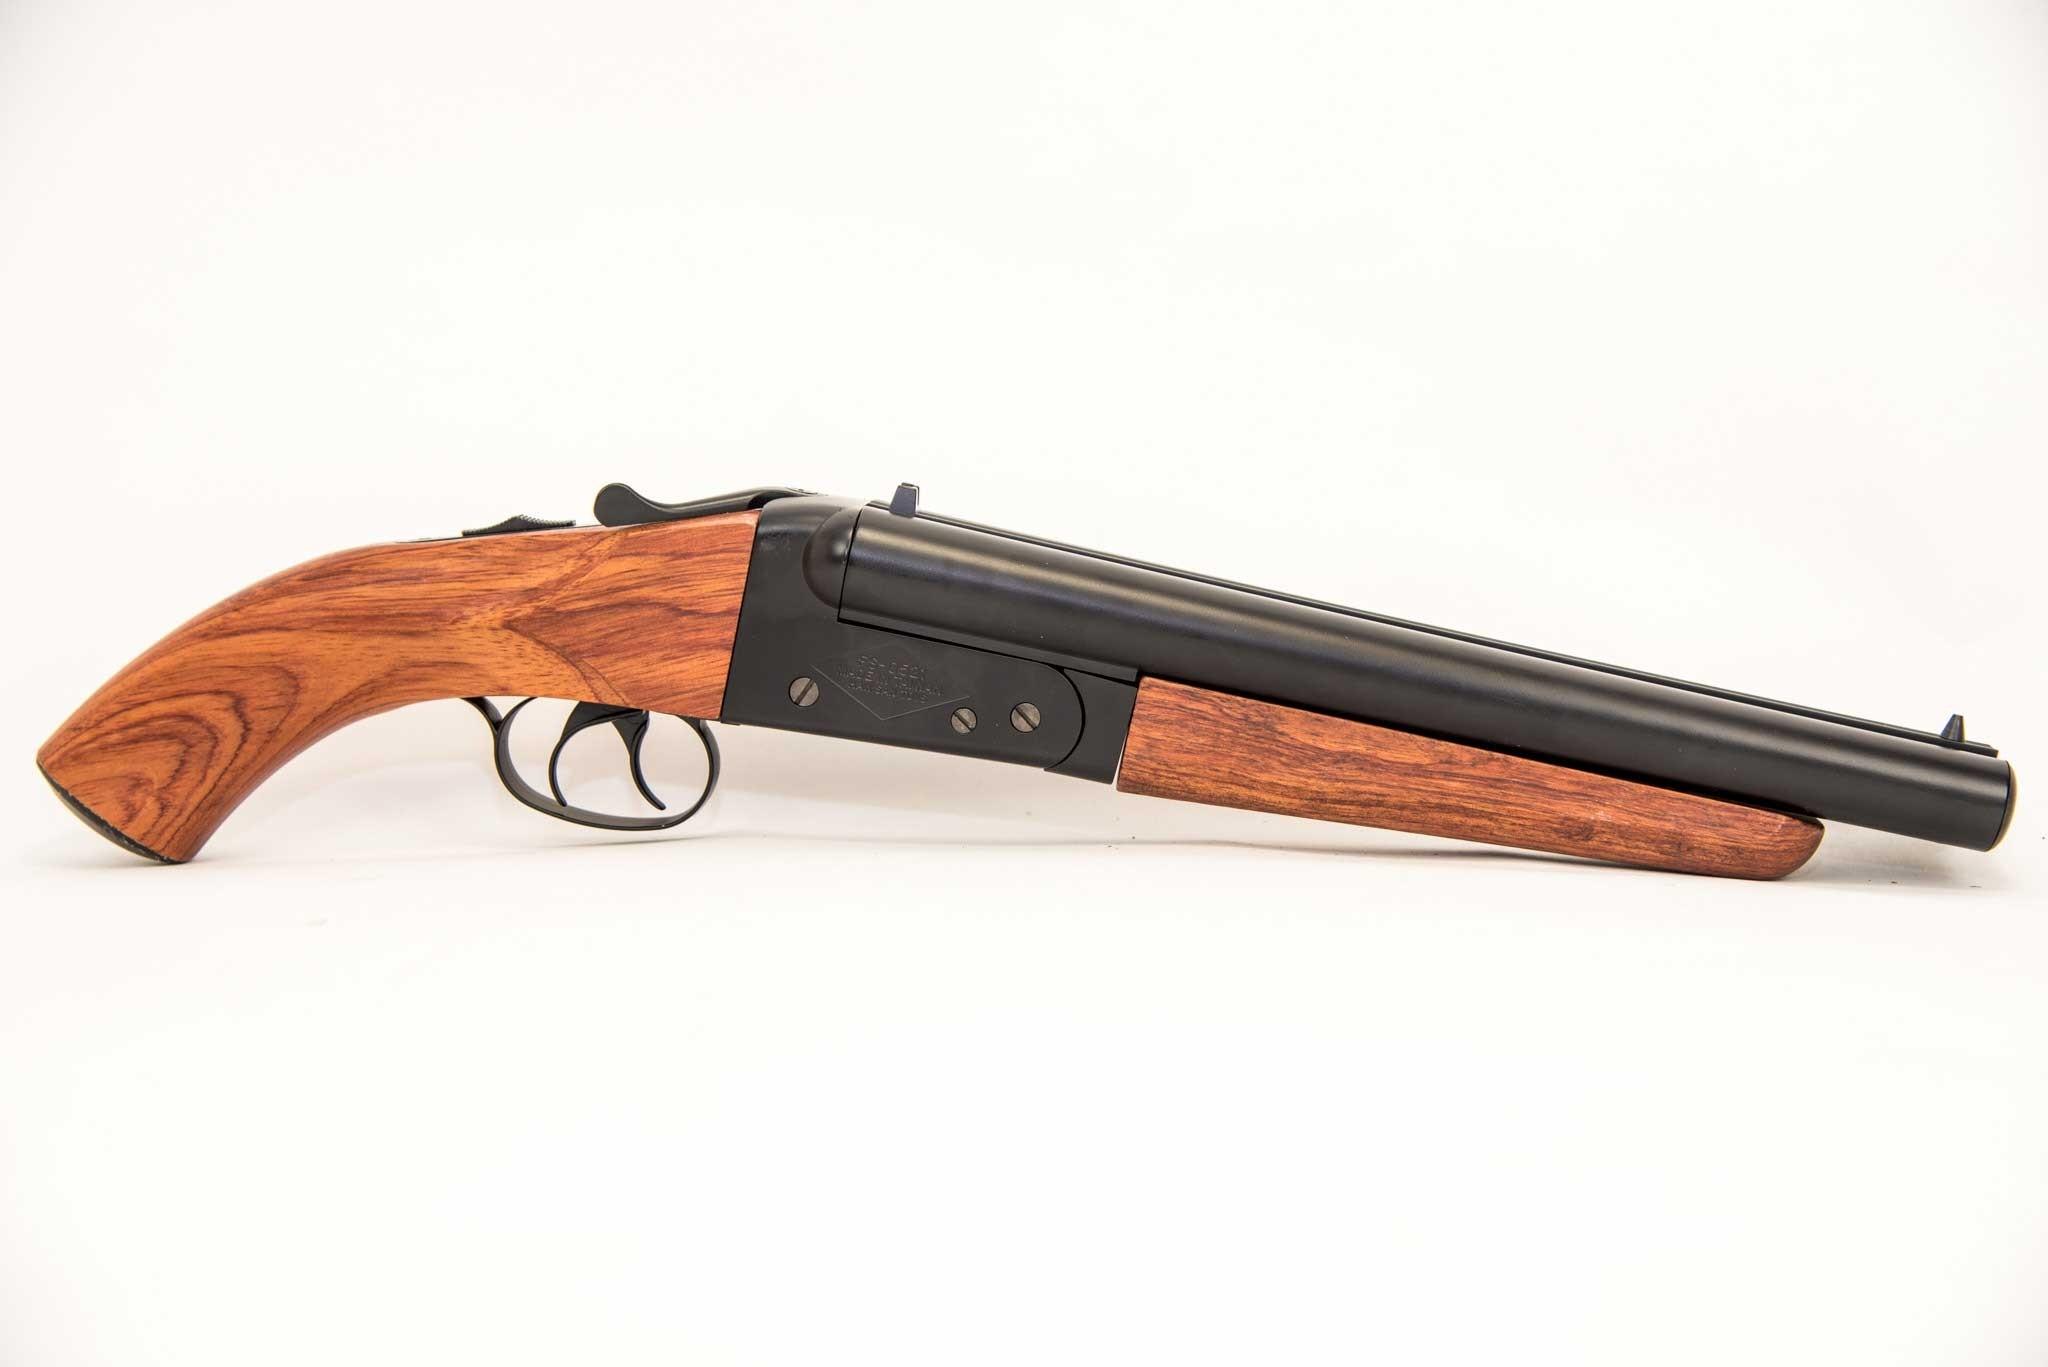 Hwasan Mad Max Double Barrel Sawn-Off Airsoft Shotgun (Wood & Metal)